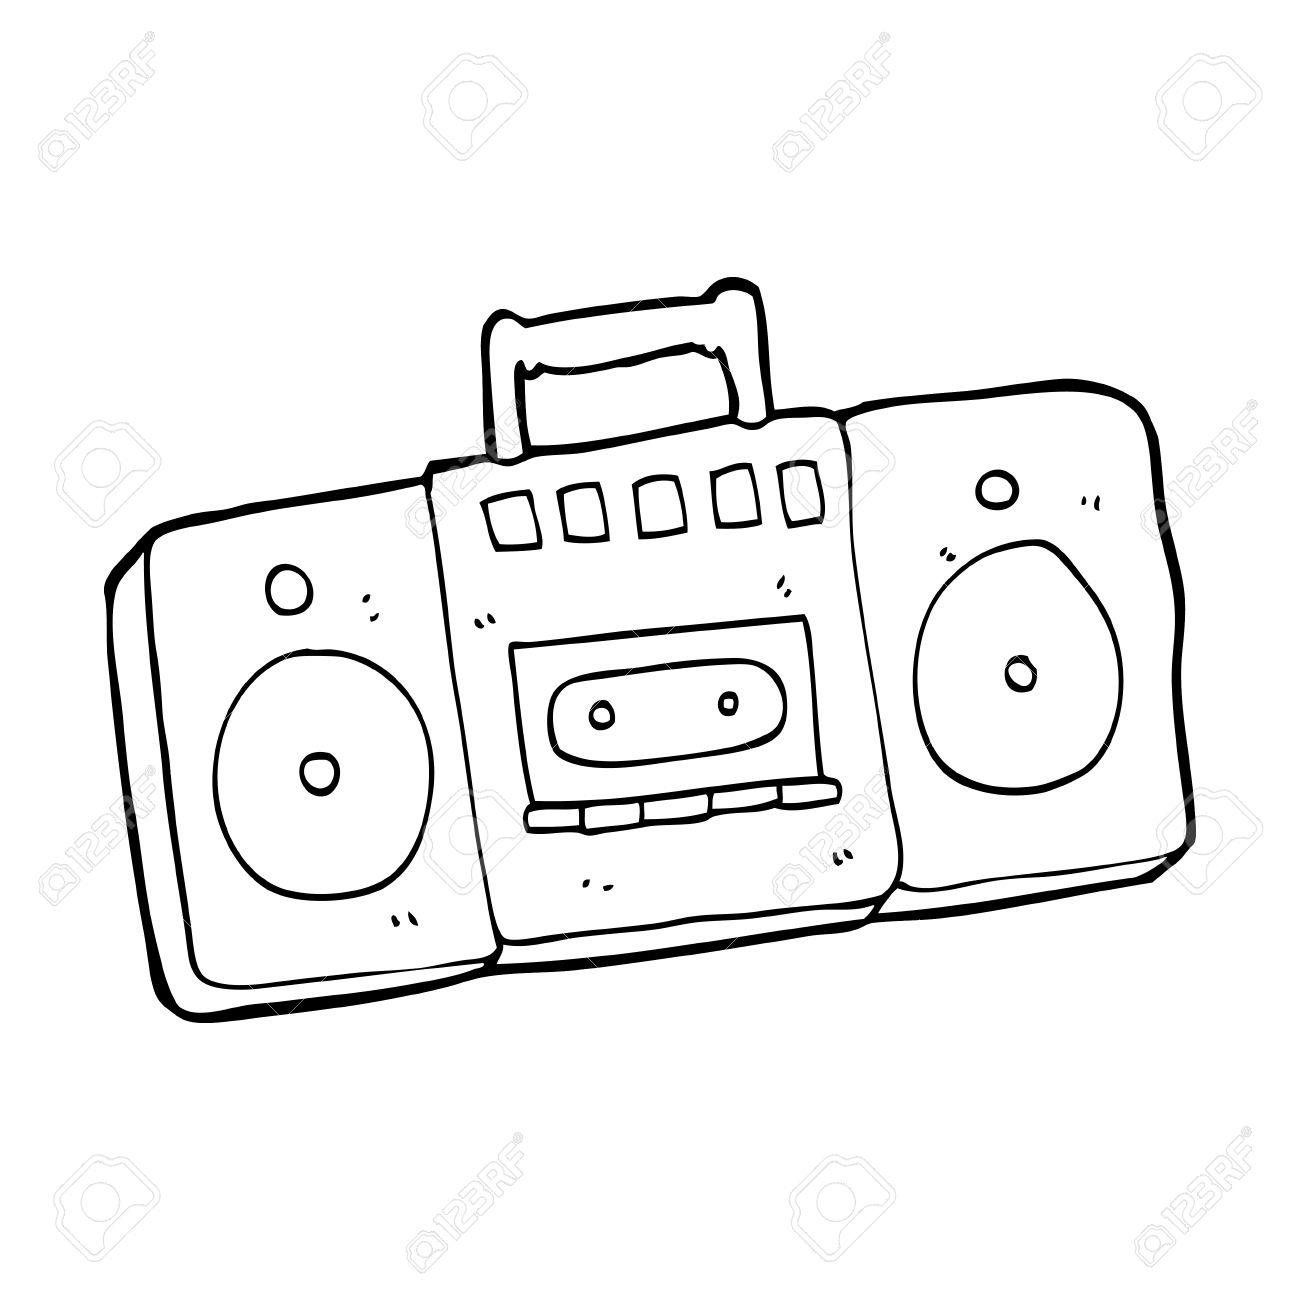 1300x1300 Drawing Of A Radio Drawing Of A Radio Cartoon Radio Cassette